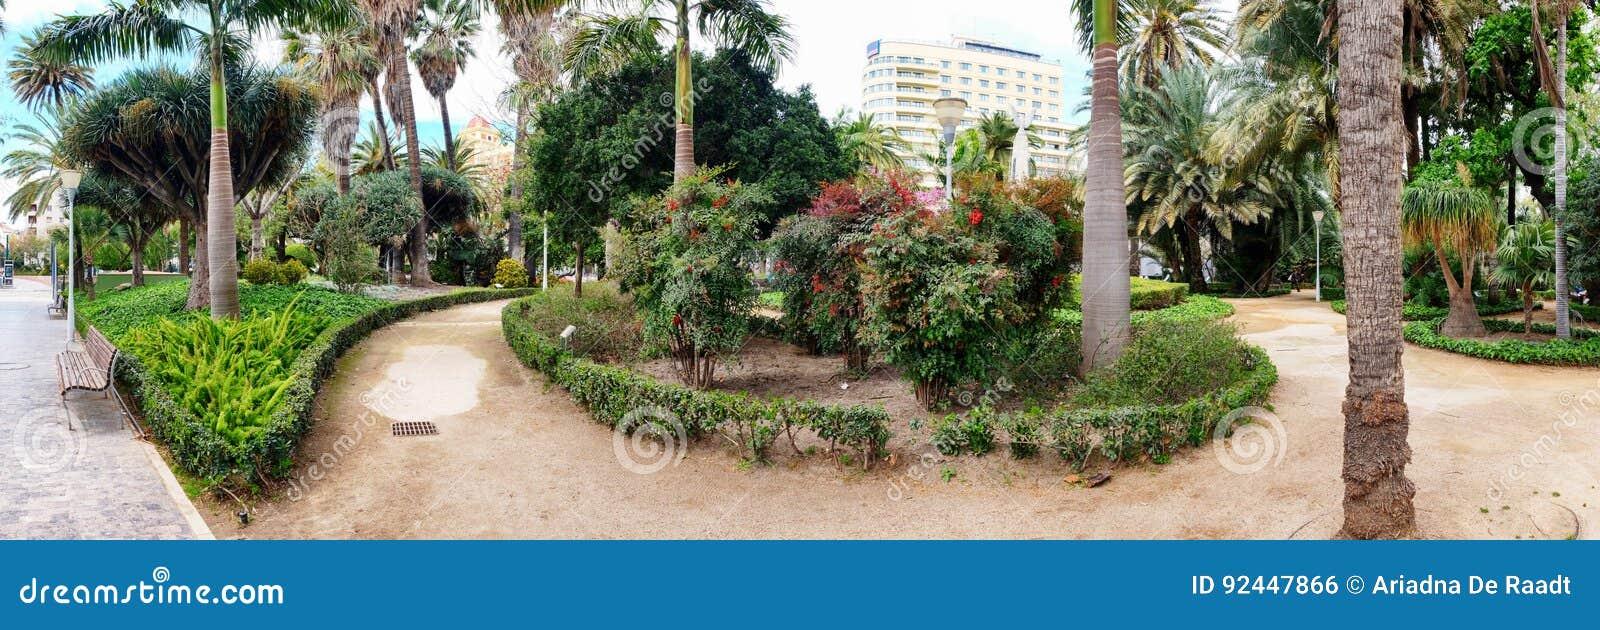 Botanisch stadspark in Malaga, Spanje